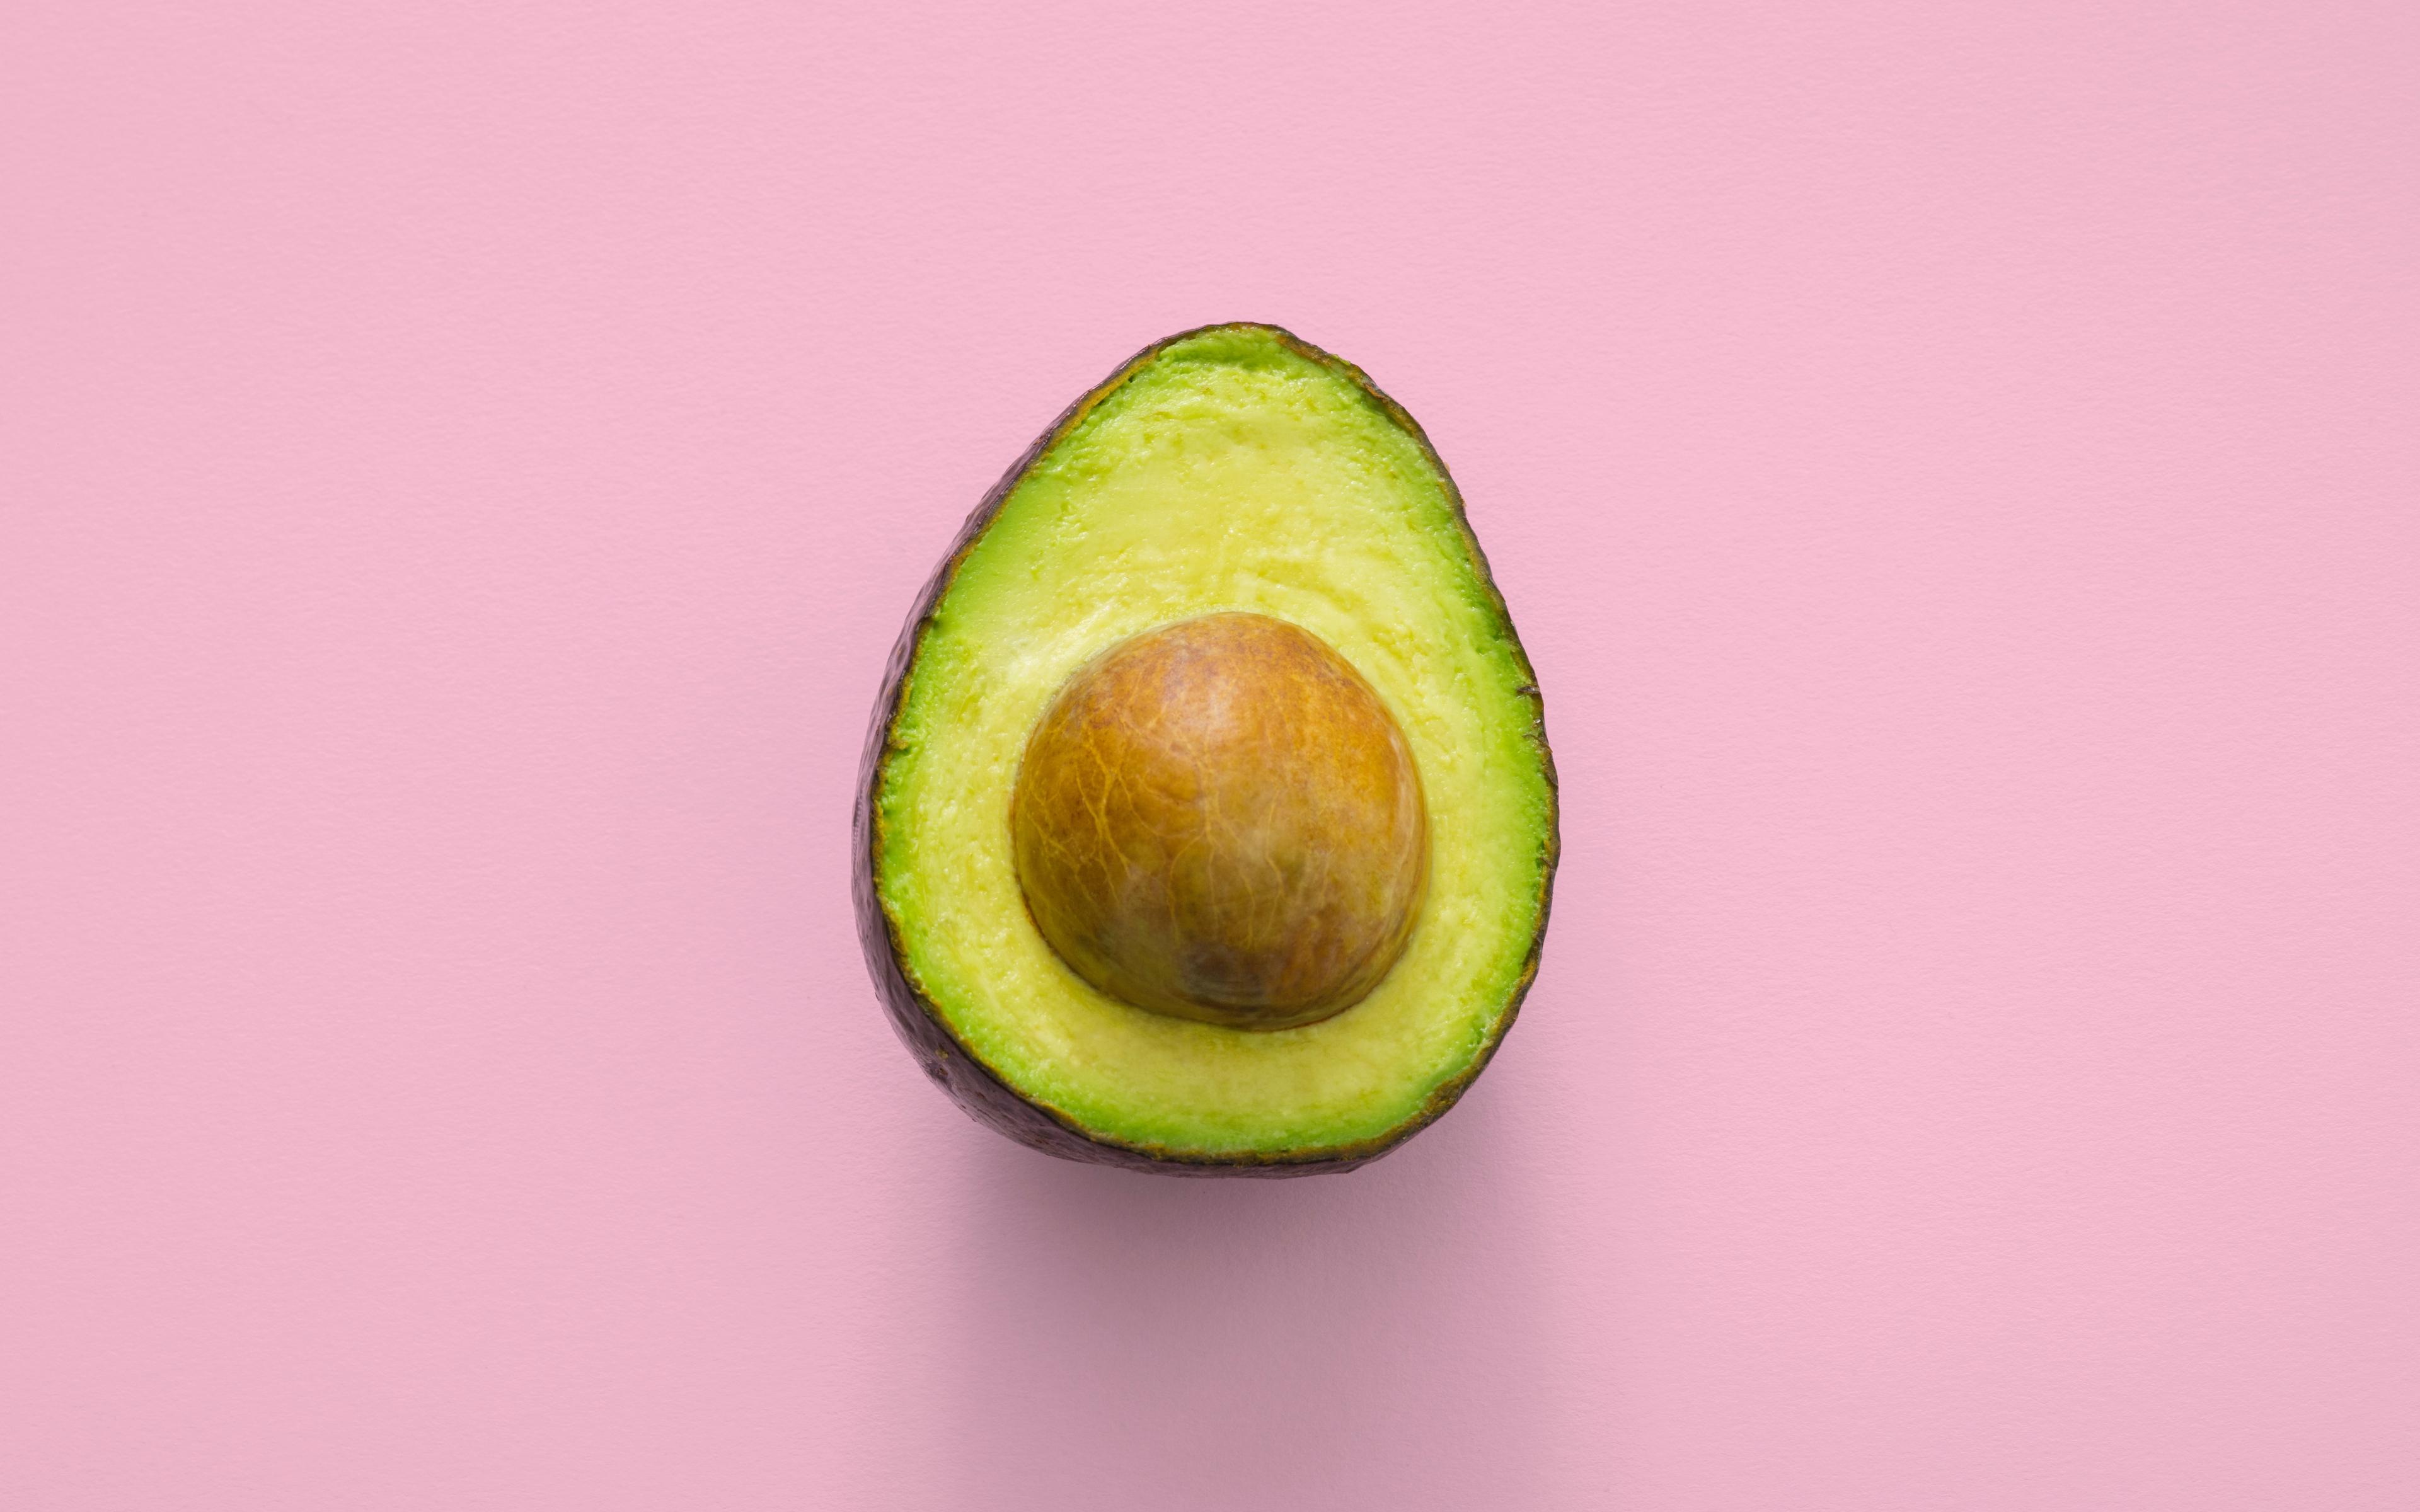 avocado minimalism pink 120543 3840x2400 - Tendencias Diseño Gráfico 2019